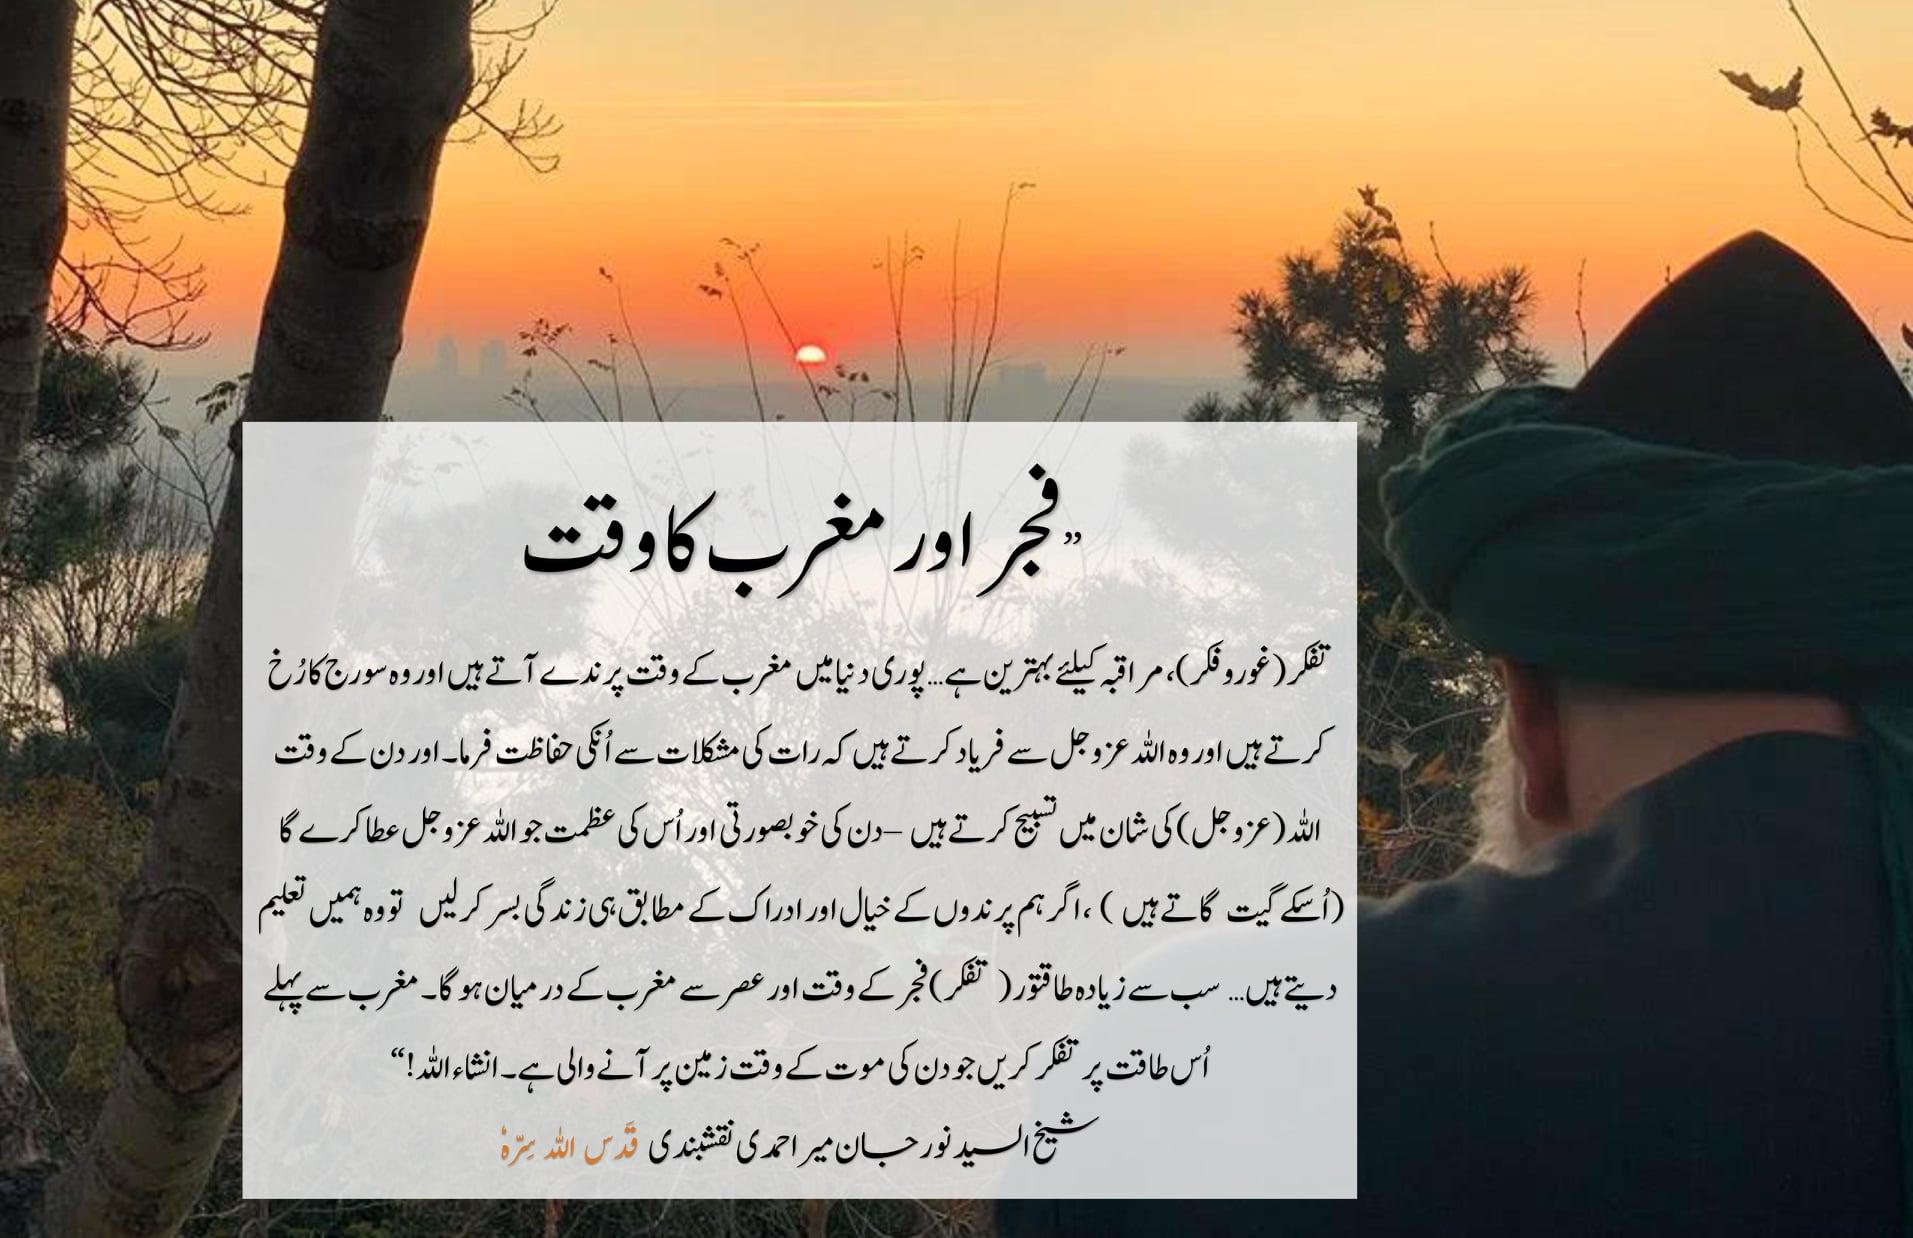 Q&A Session with Shaykh Sayed Nurjan qs   Q6: Sayidee, if I cannot make taffaku...